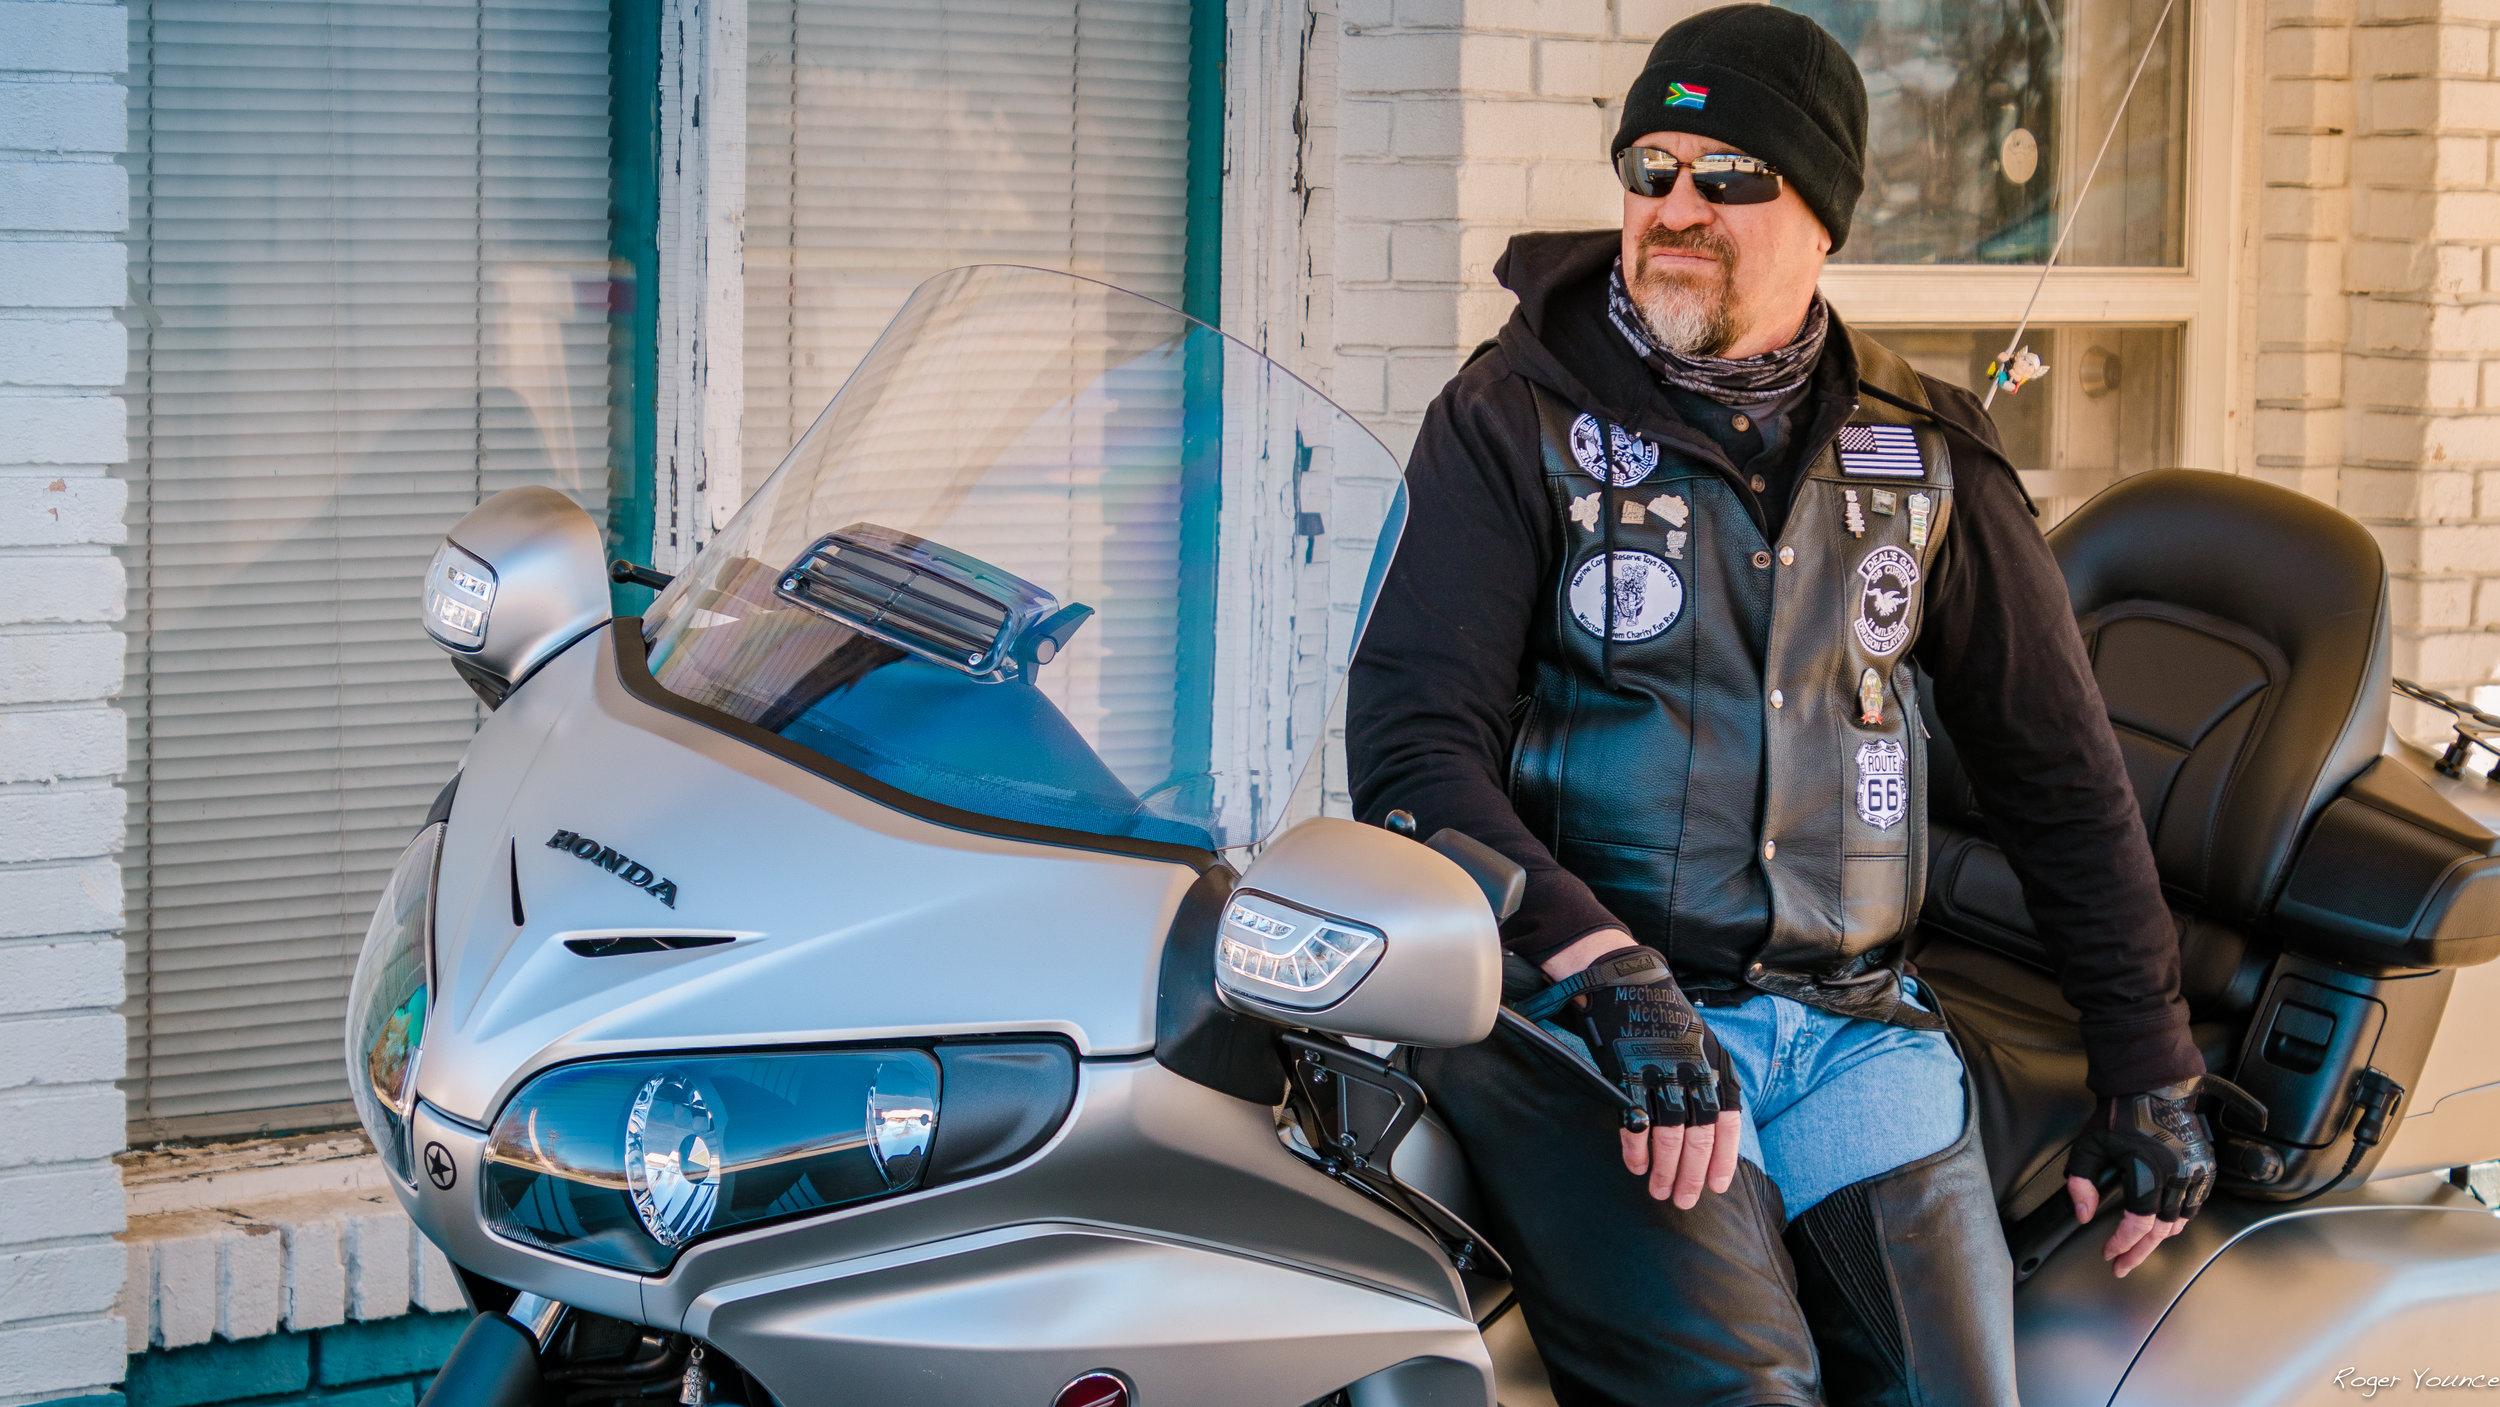 biker-Honda-Goldwing-motorcycle-portrait-photography-photographer-Jamestown-north-carolina-bike-Harley